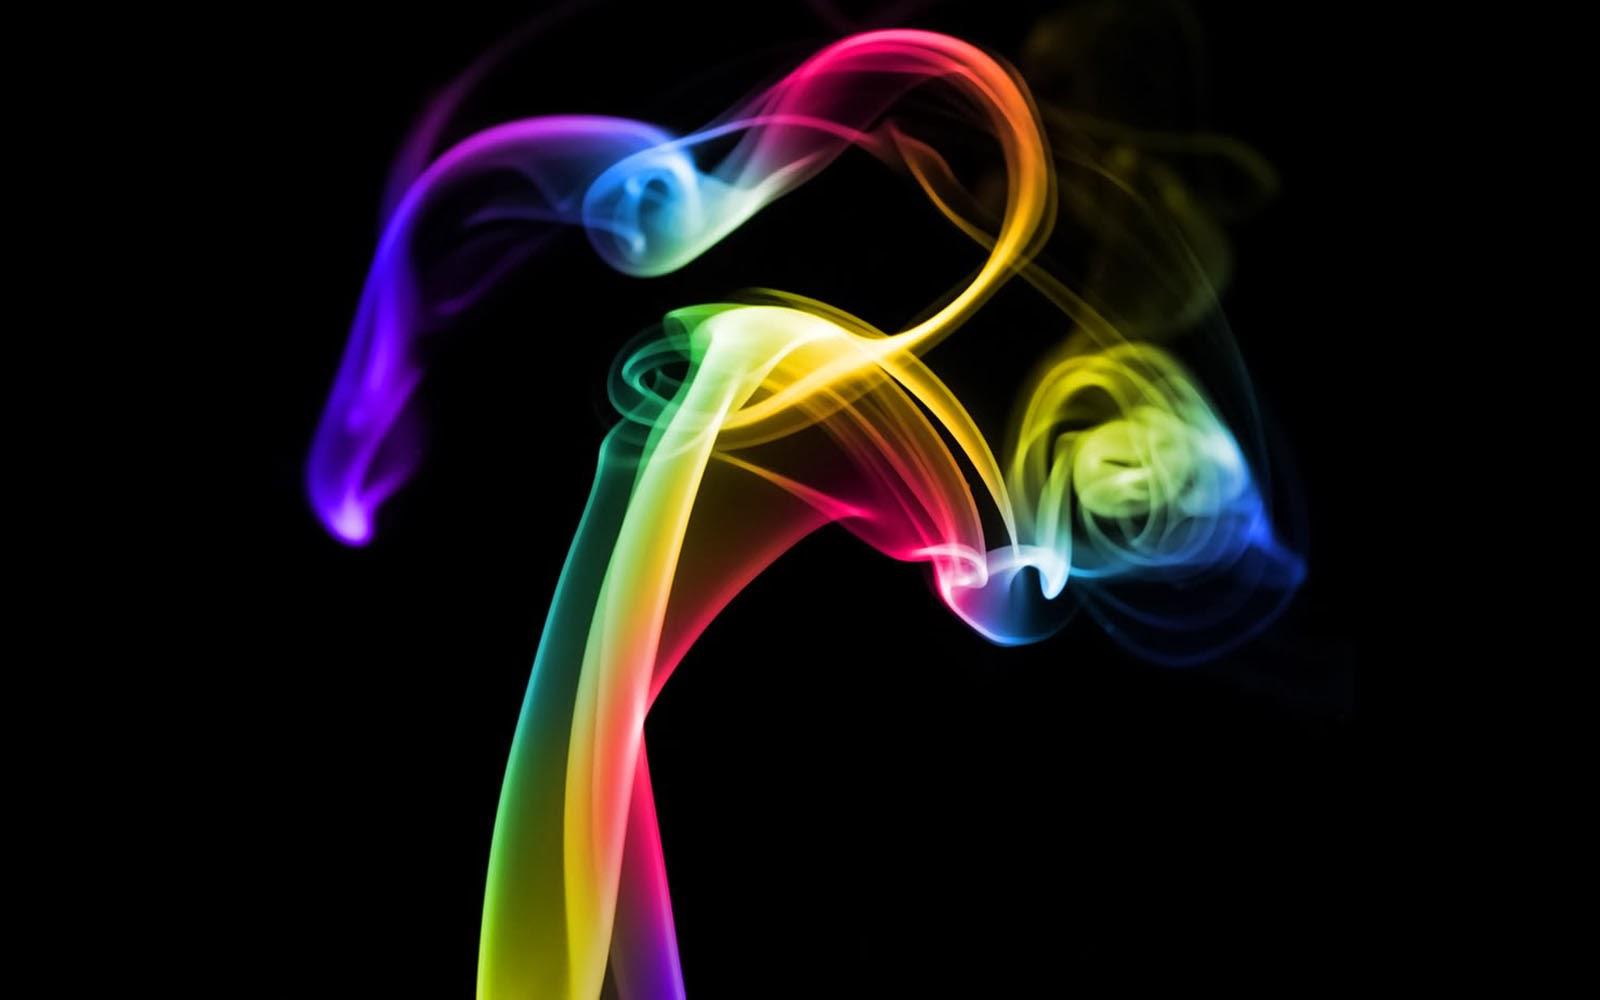 Colorful Smoke Wallpapers Colorful Smoke DesktopWallpapers Colorful 1600x1000